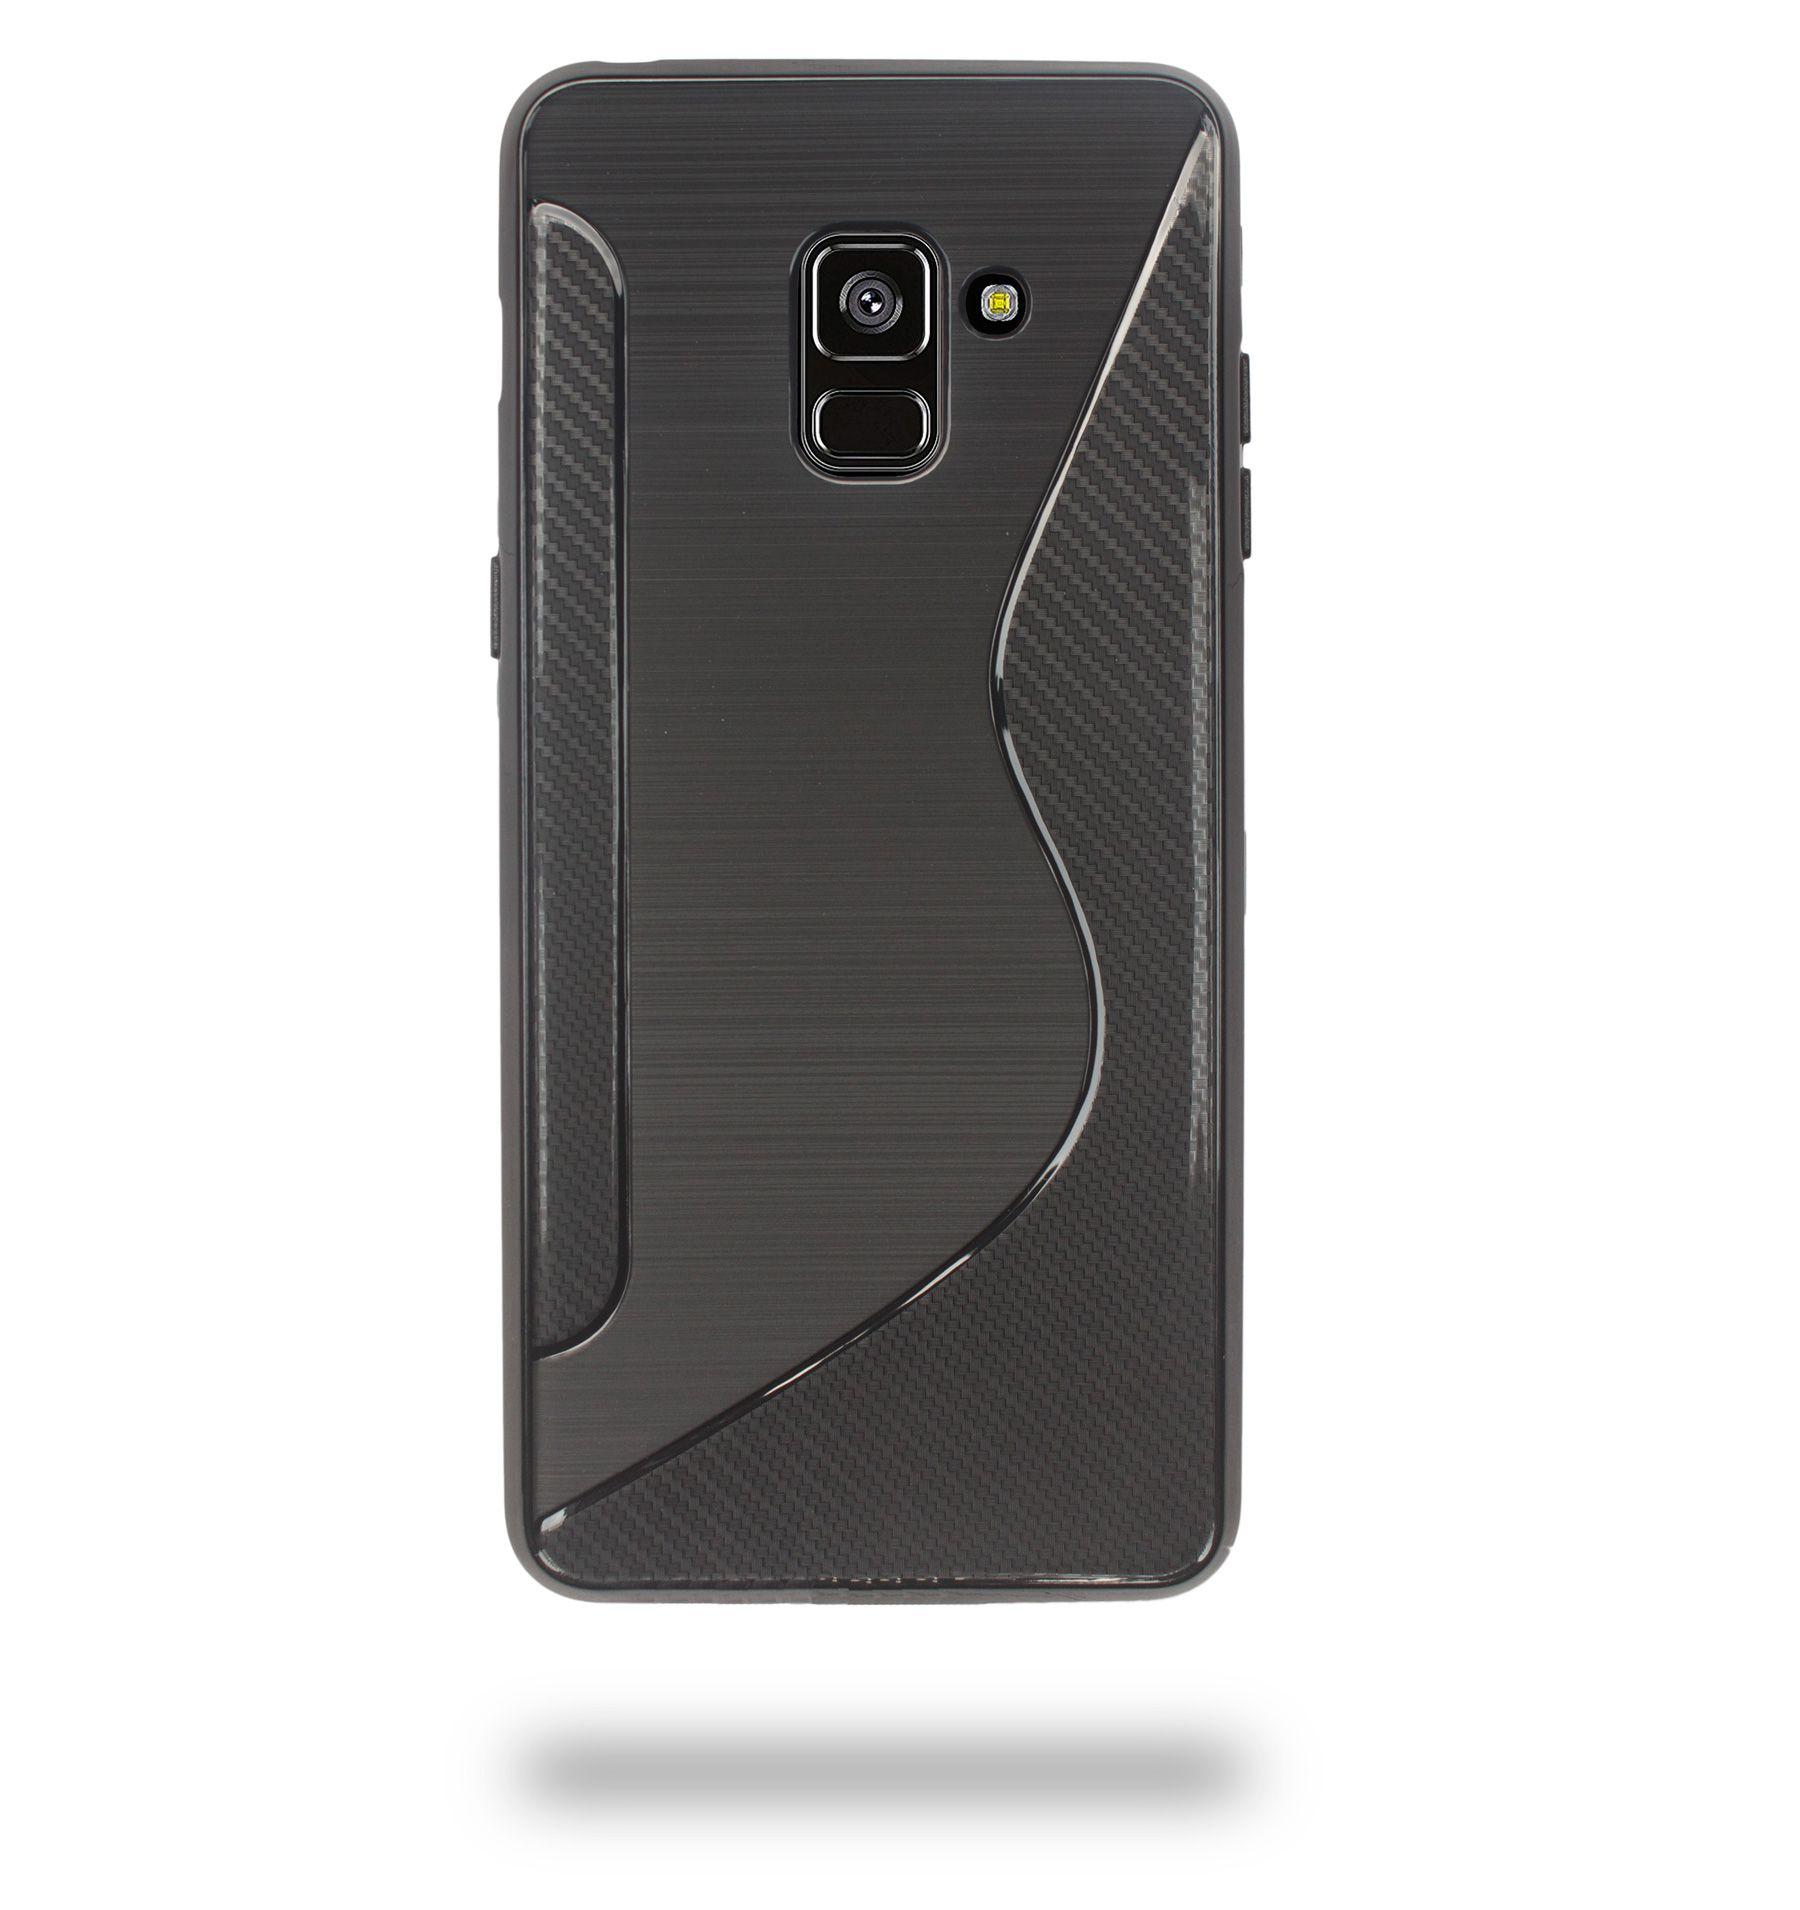 newest ee091 bbd36 Samsung Galaxy A8 Plus Shock Proof Case Ceego - Black